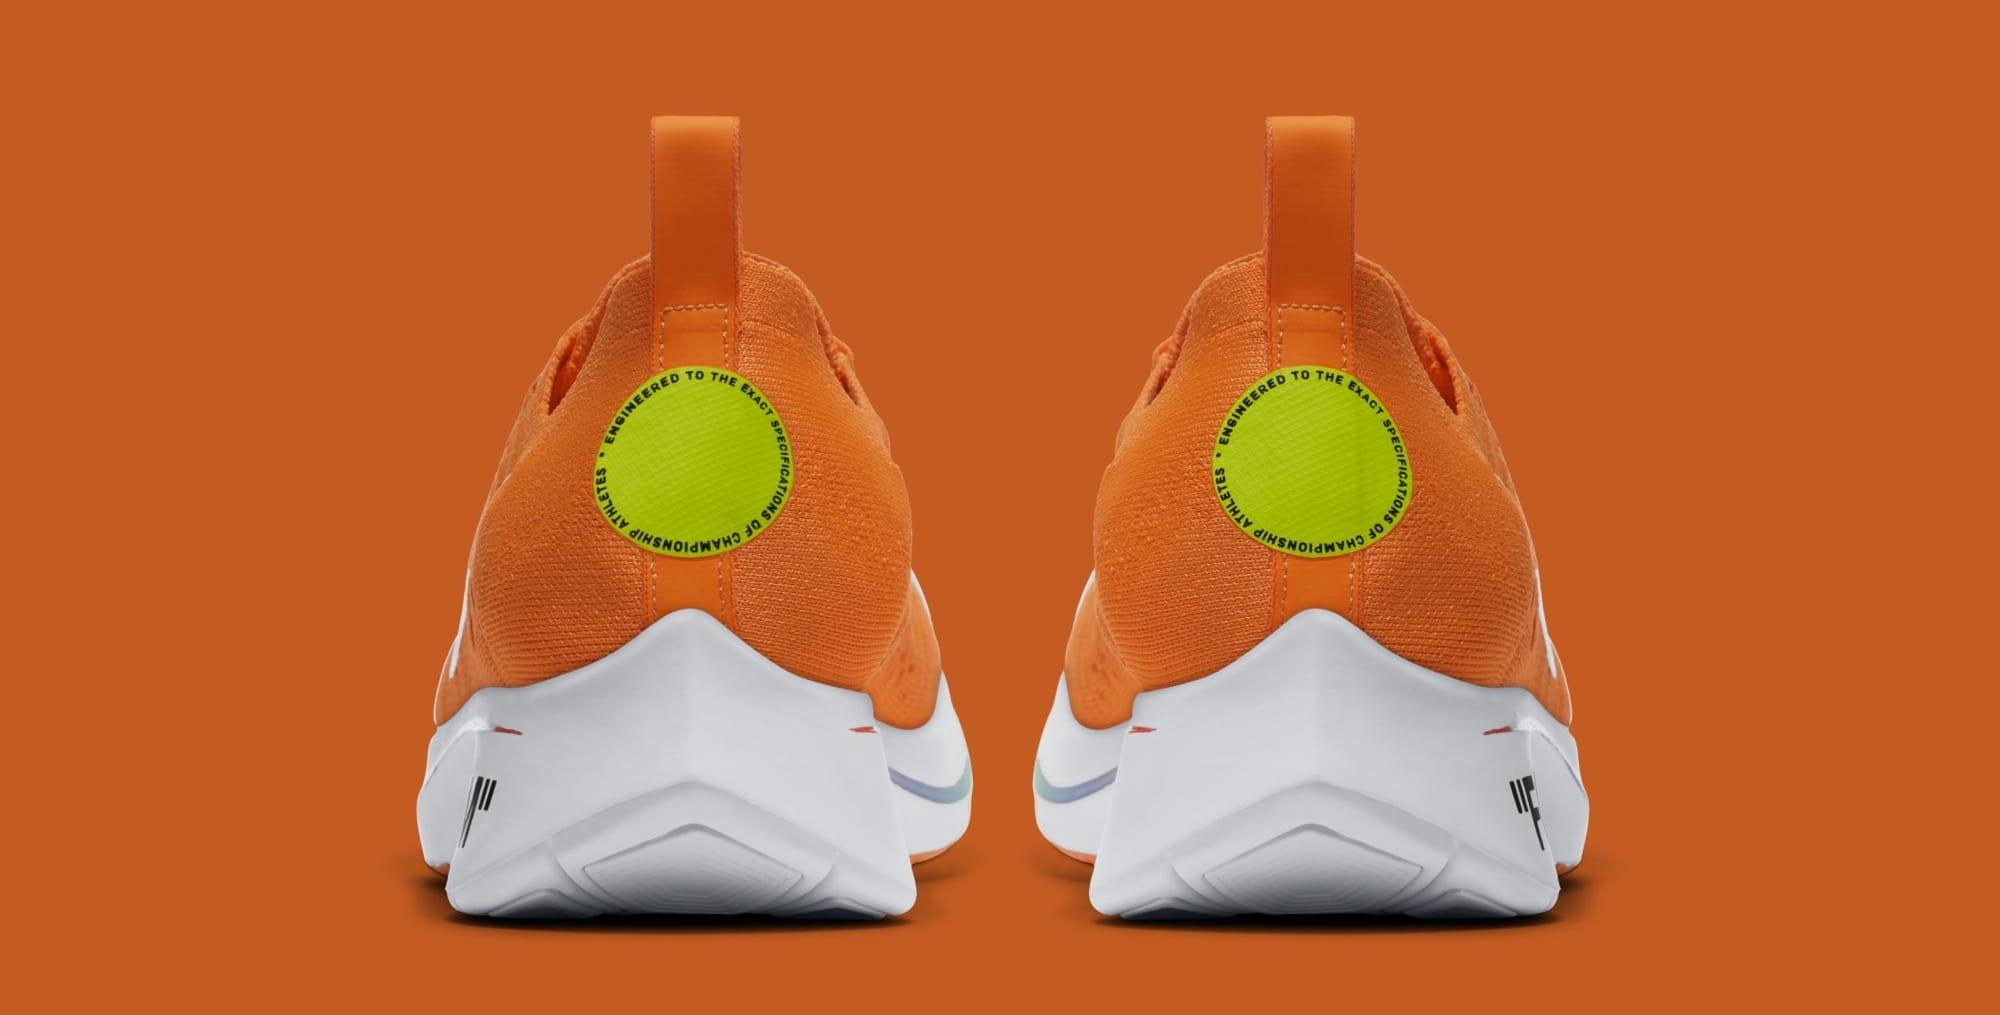 Off-White x Nike Zoom Fly Mercurial Flyknit 'Total Orange' AO2115-800 (Heel)